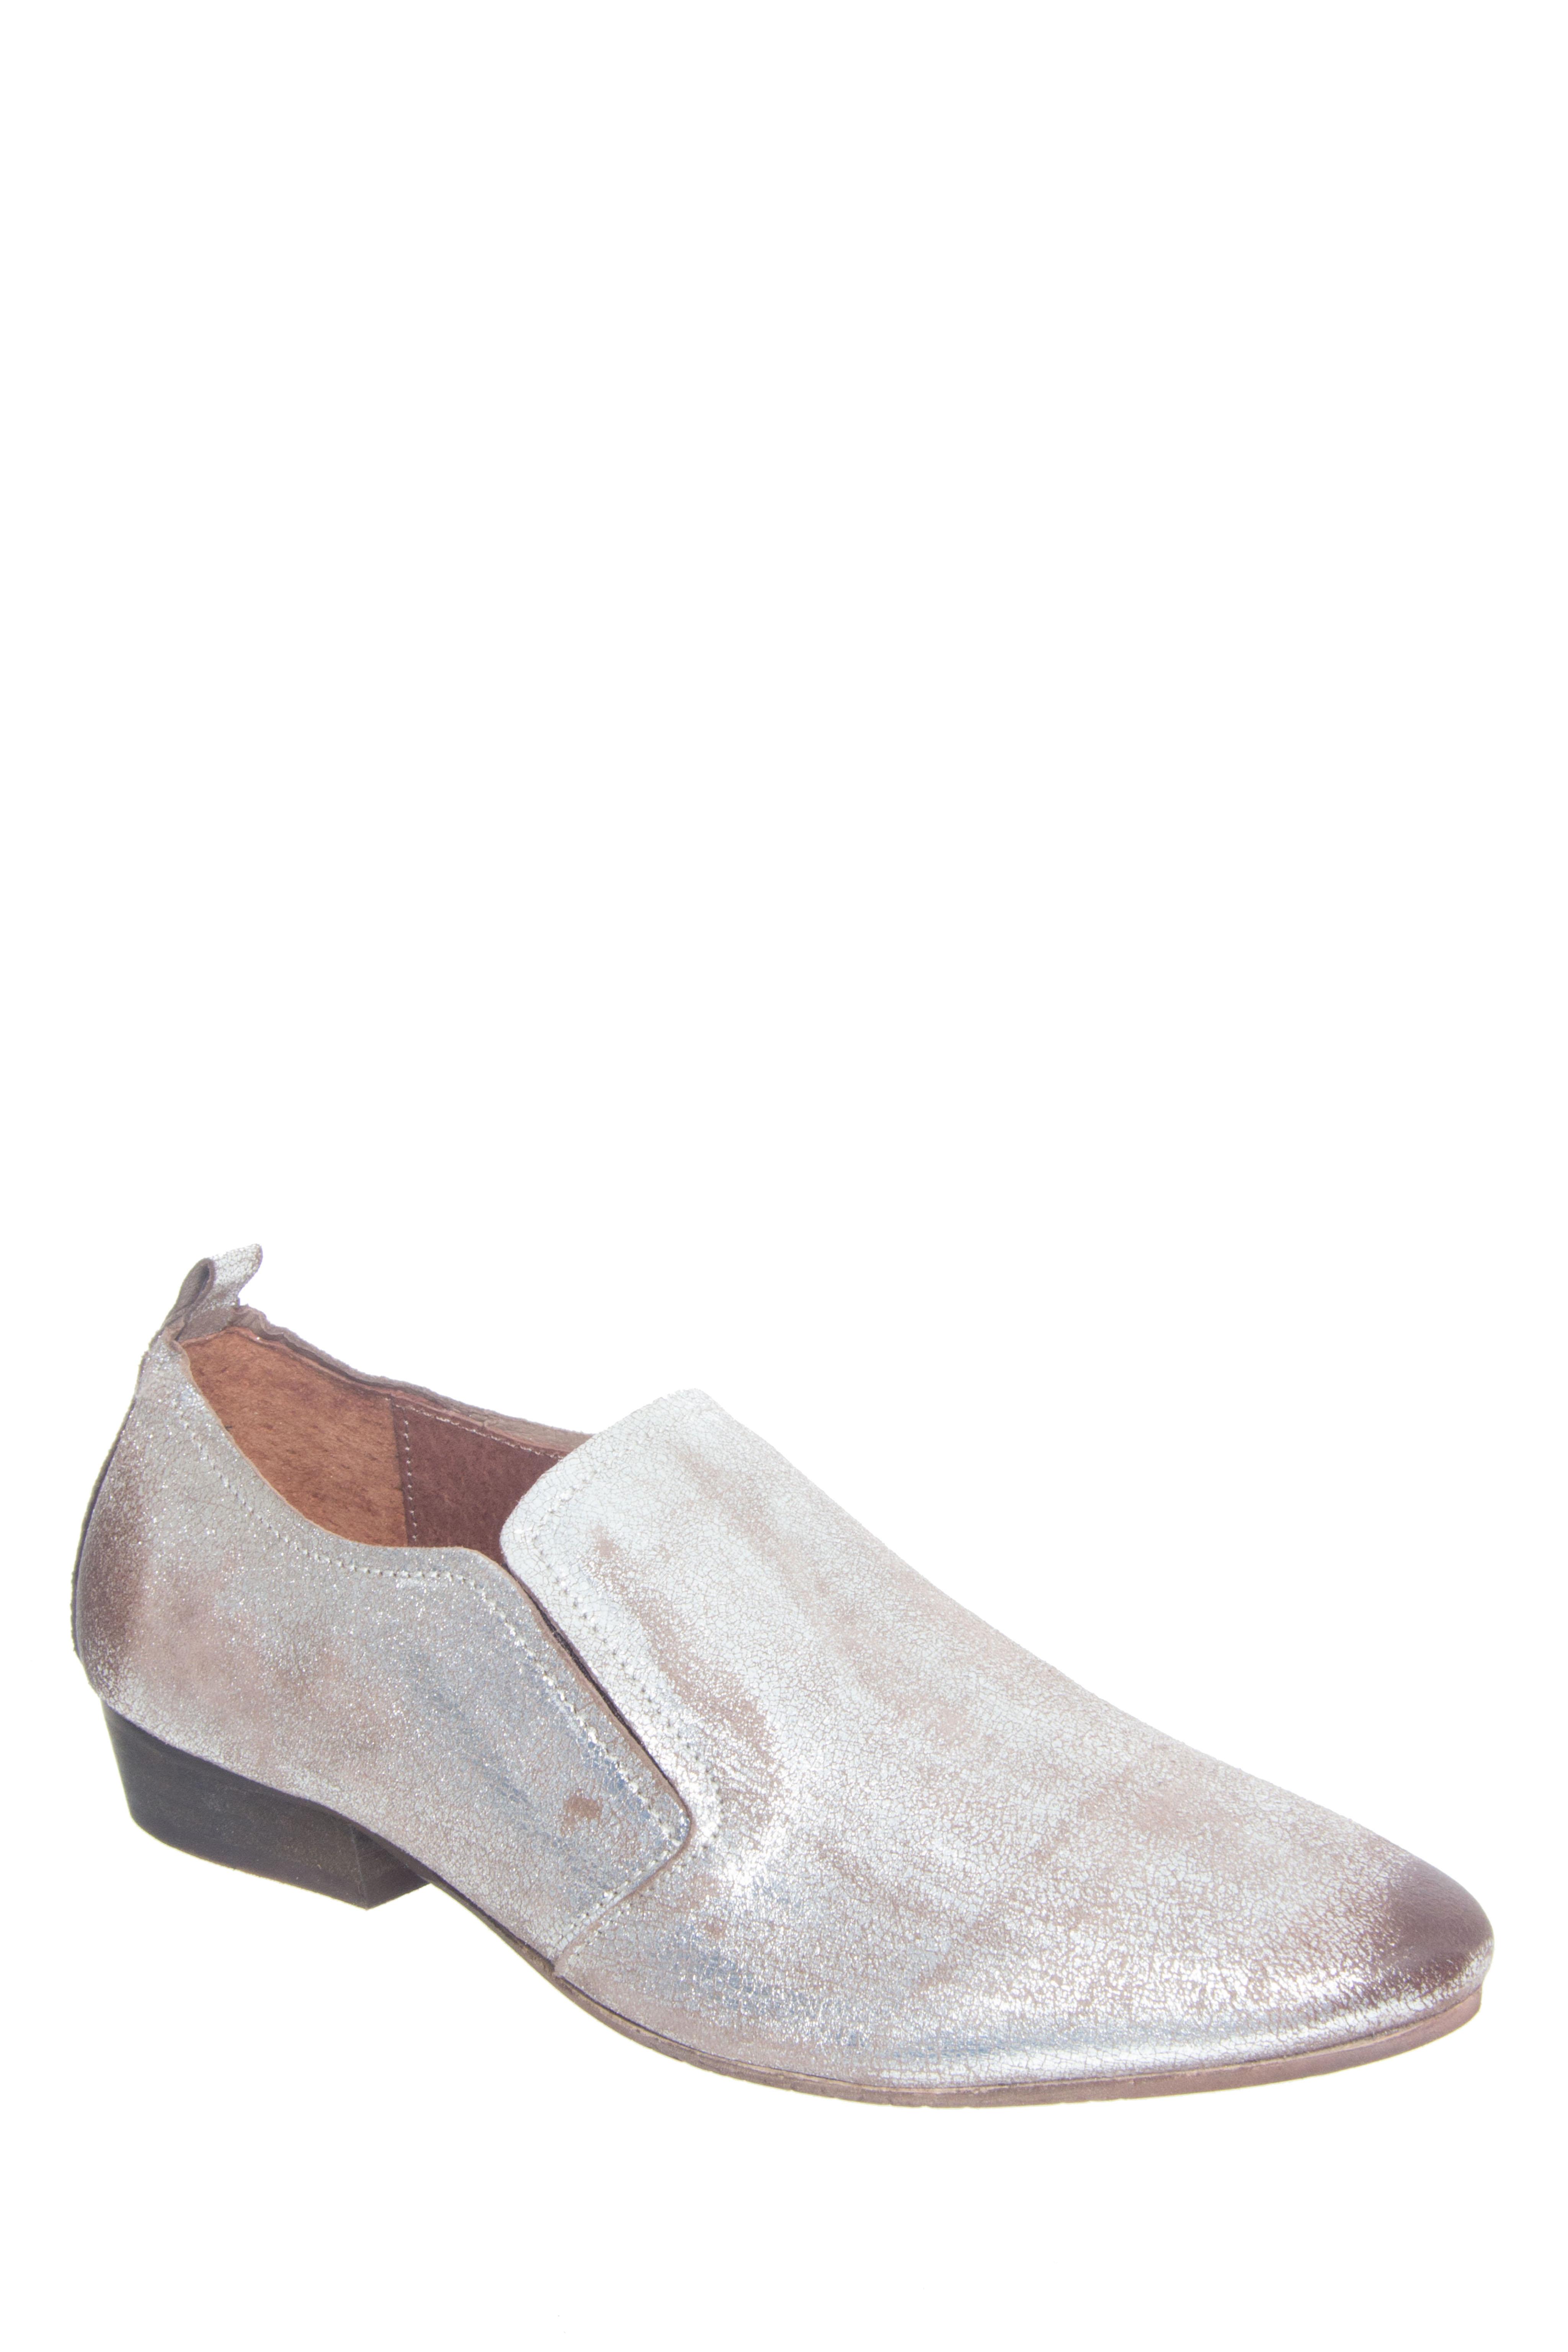 Seychelles Skein Low Heel Loafers - Pewter